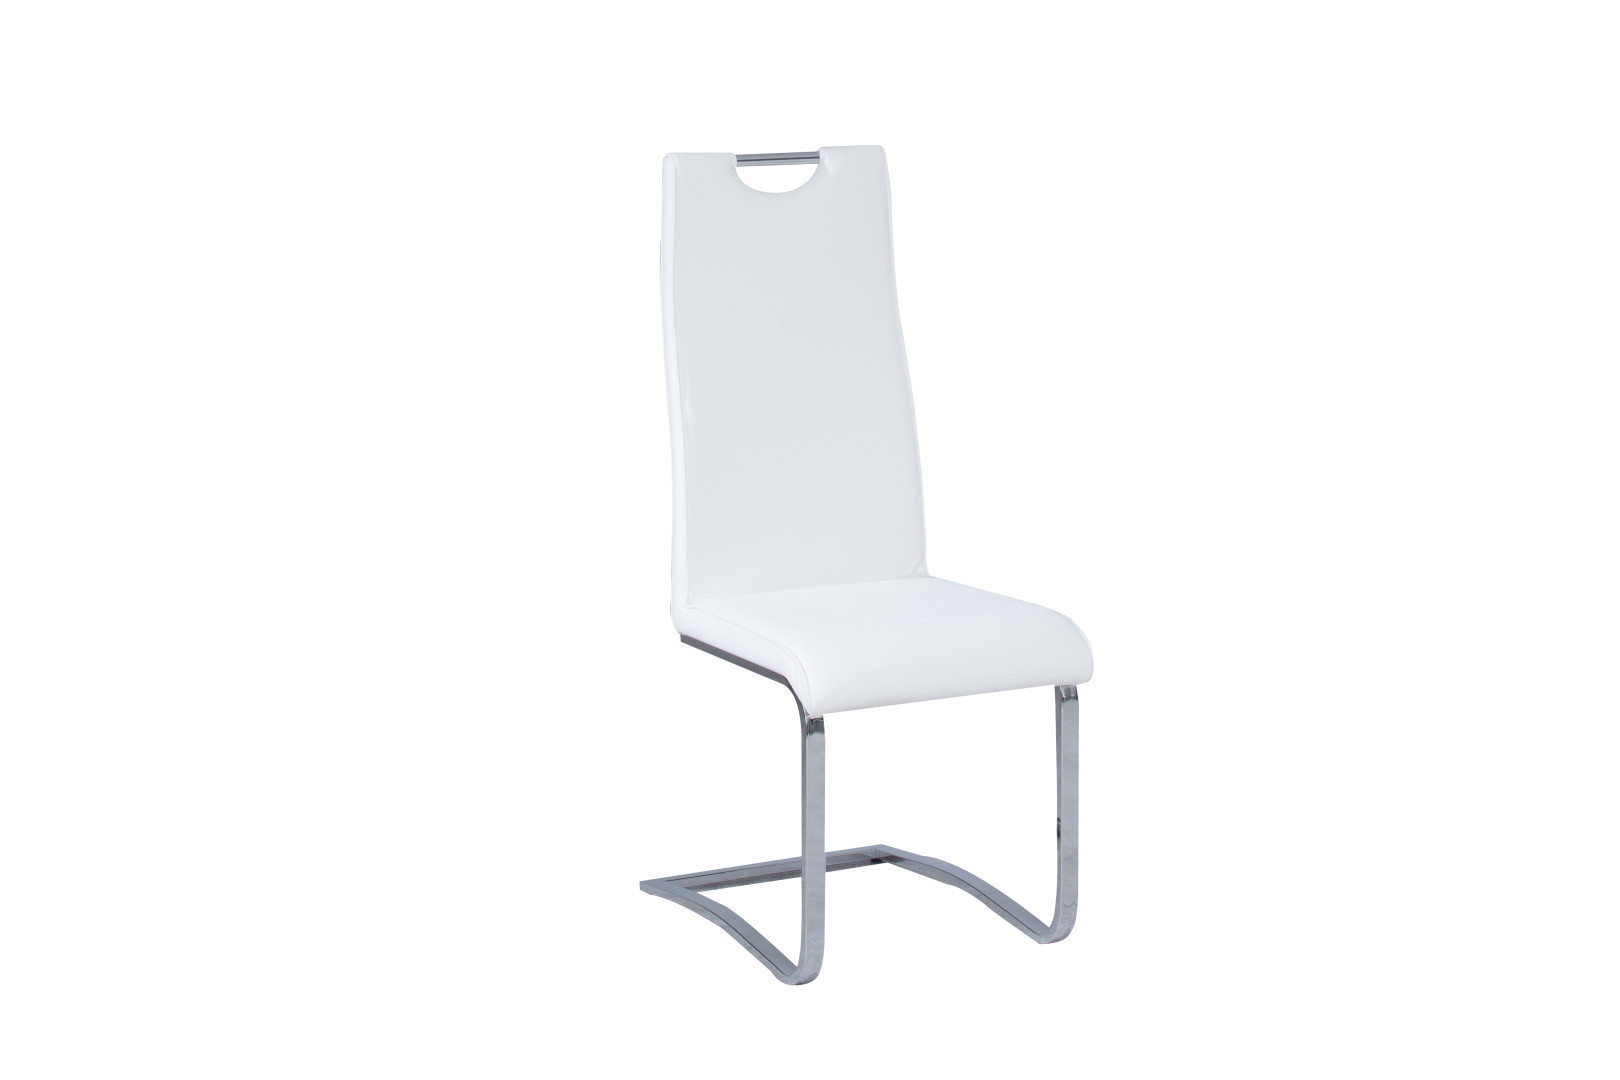 faad03163417 Jedálenská stolička - Decodom - Eugen (biela koženka)